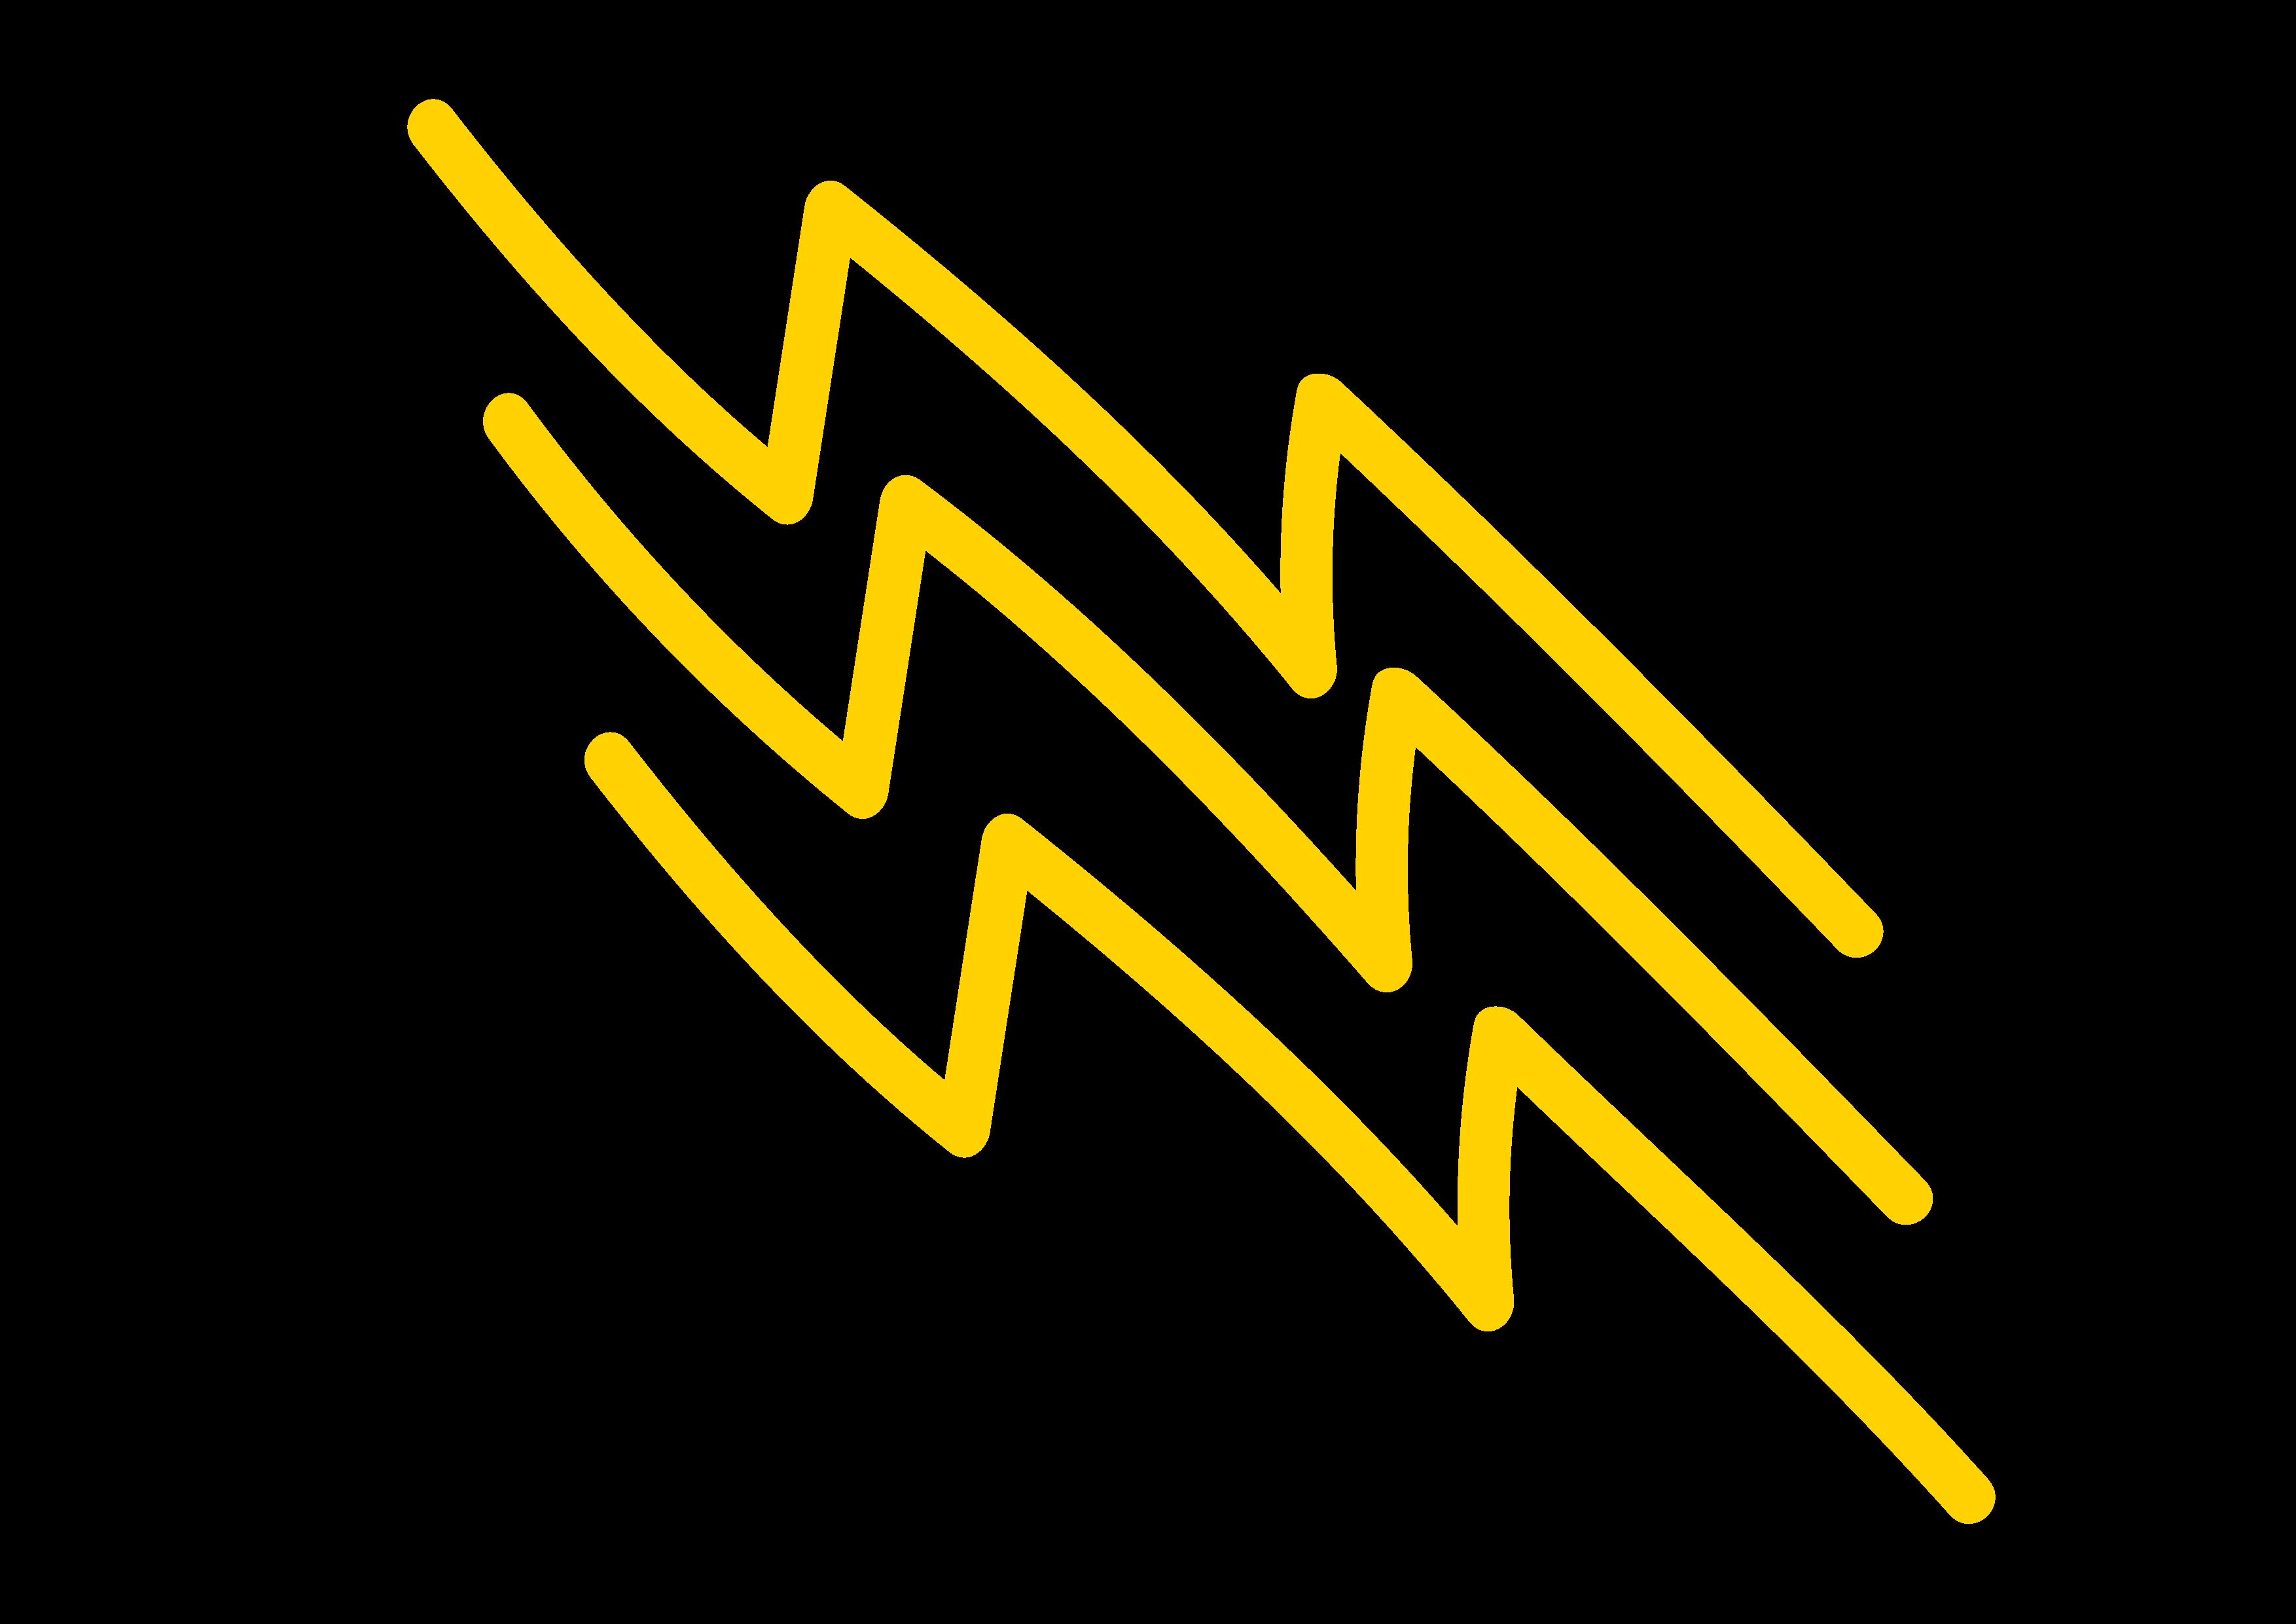 a hand drawn yellow lightning bolt